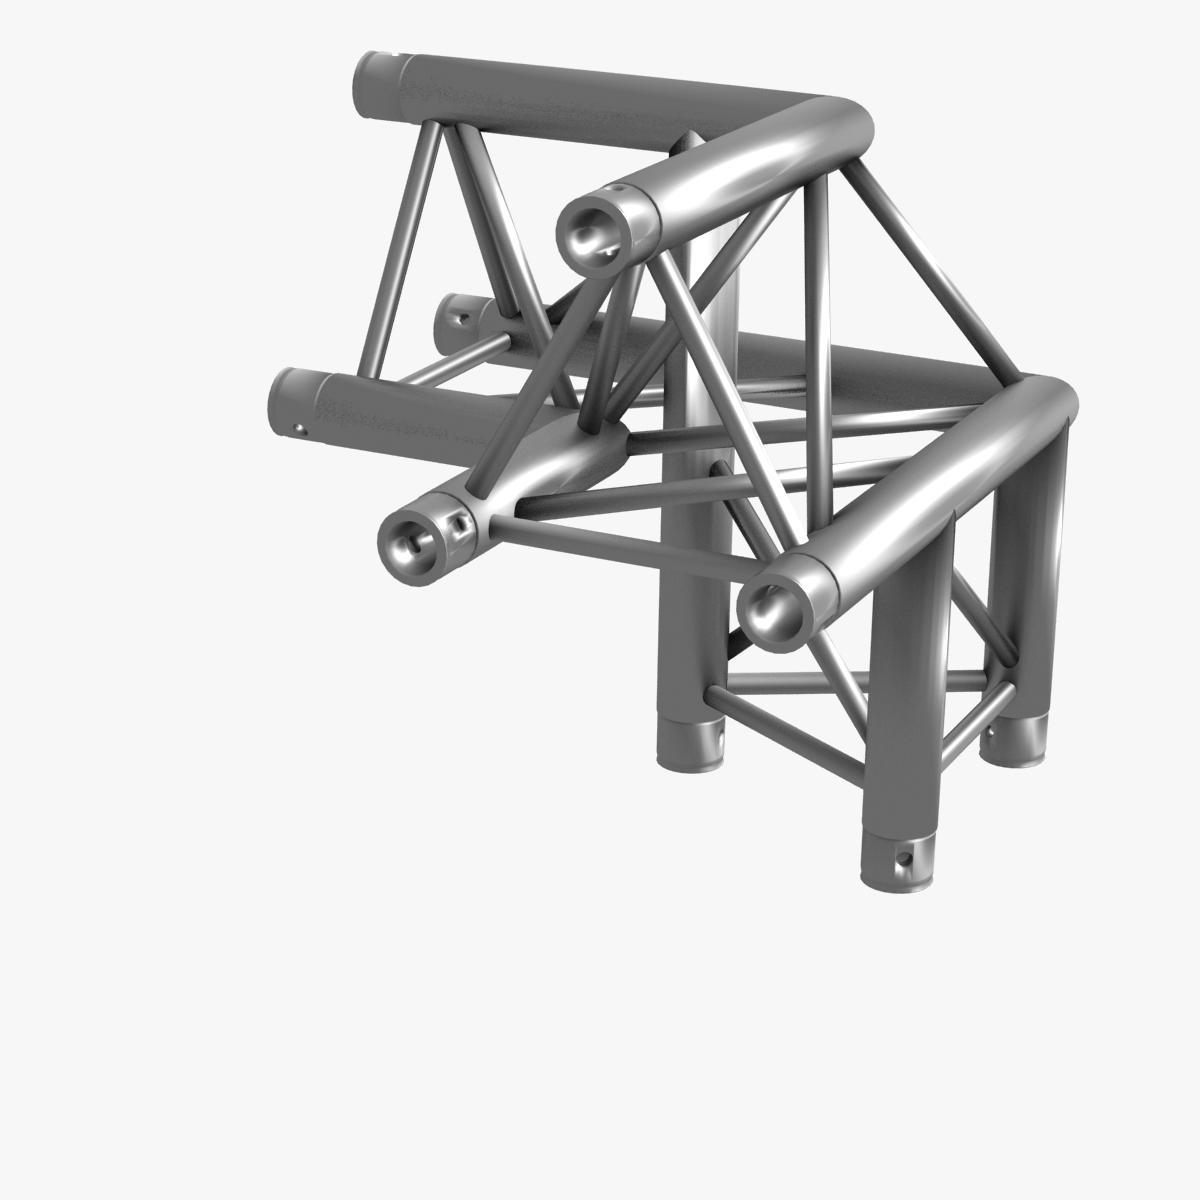 triangular trusses (collection 55 modular pieces) 3d model 3ds max dxf fbx c4d dae texture obj 216237